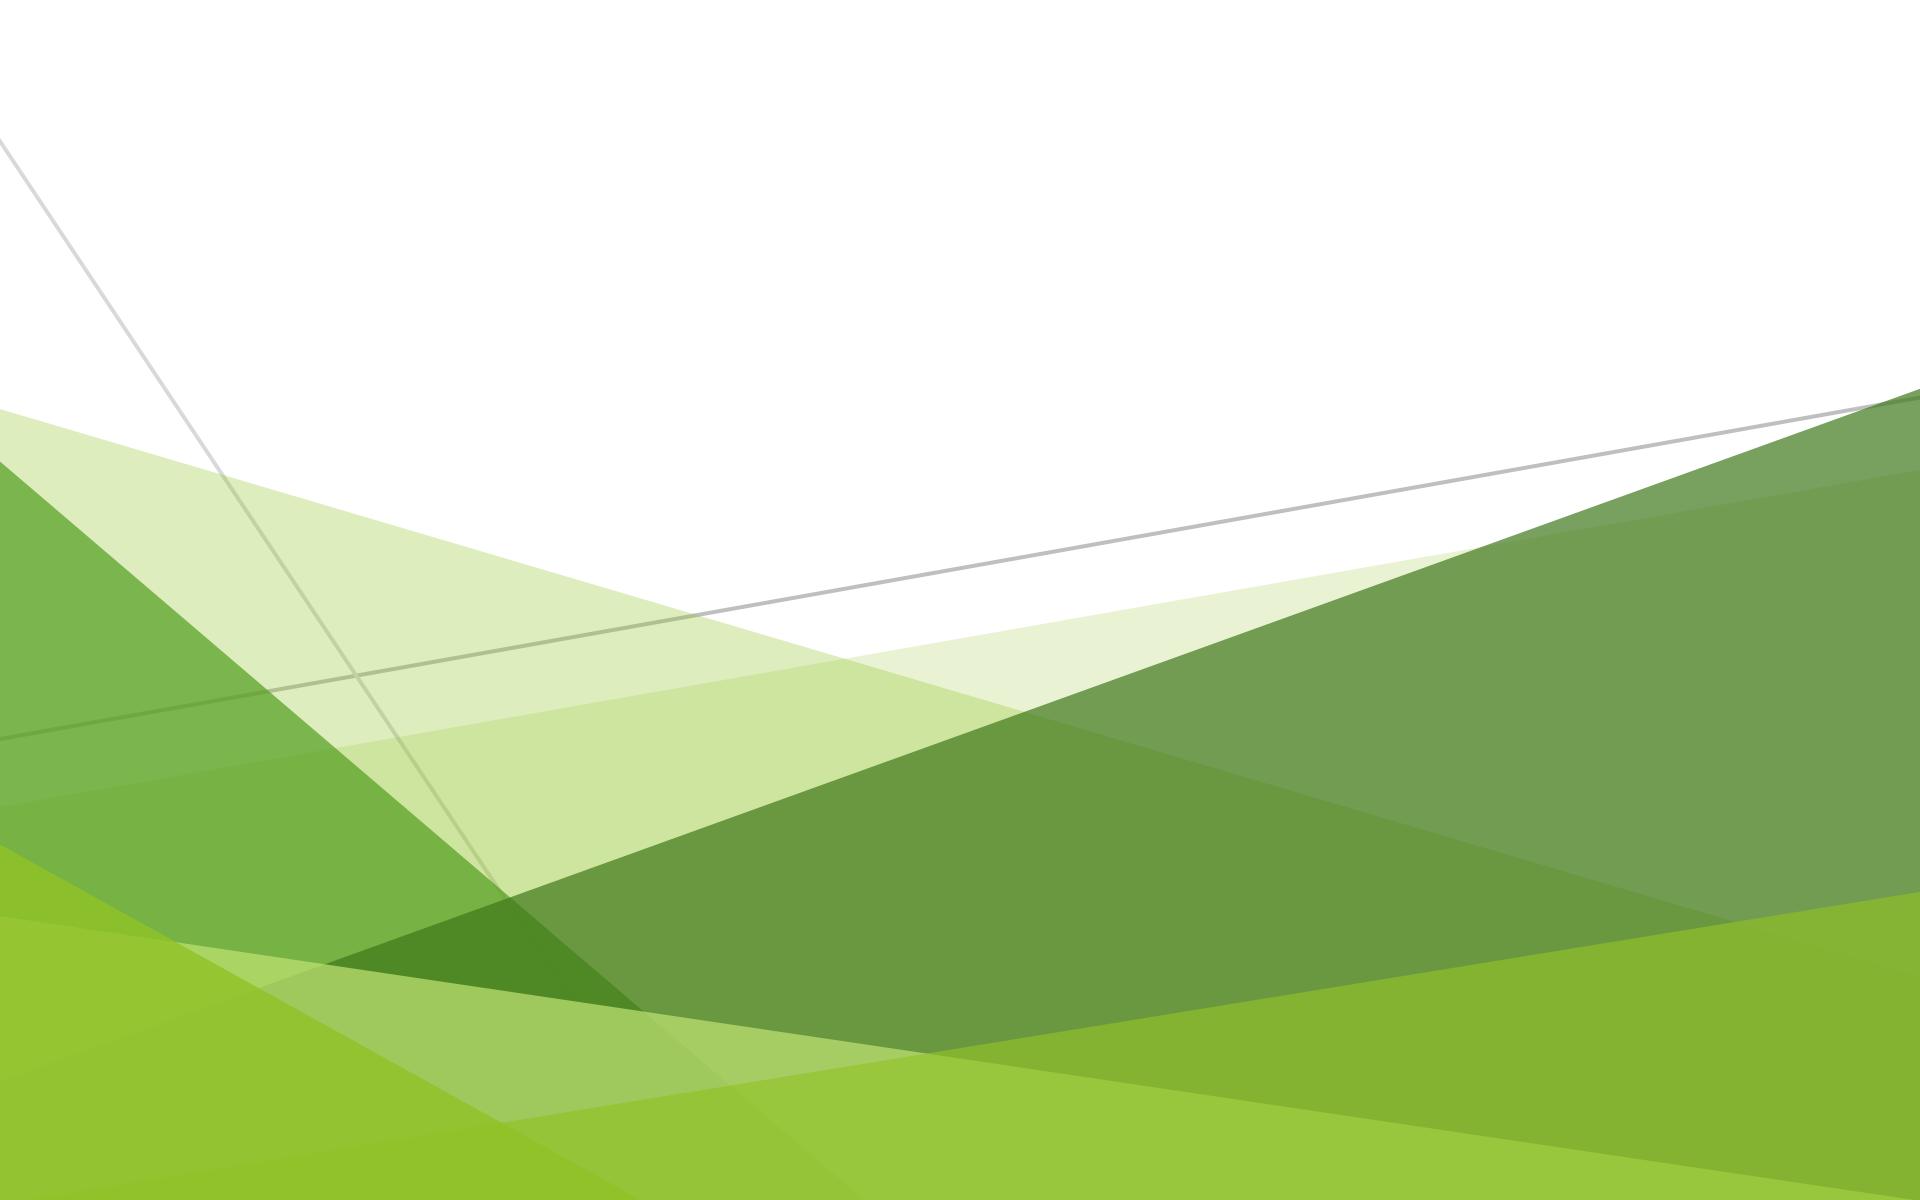 Green Swirl Wallpaper ... White Iphone Png